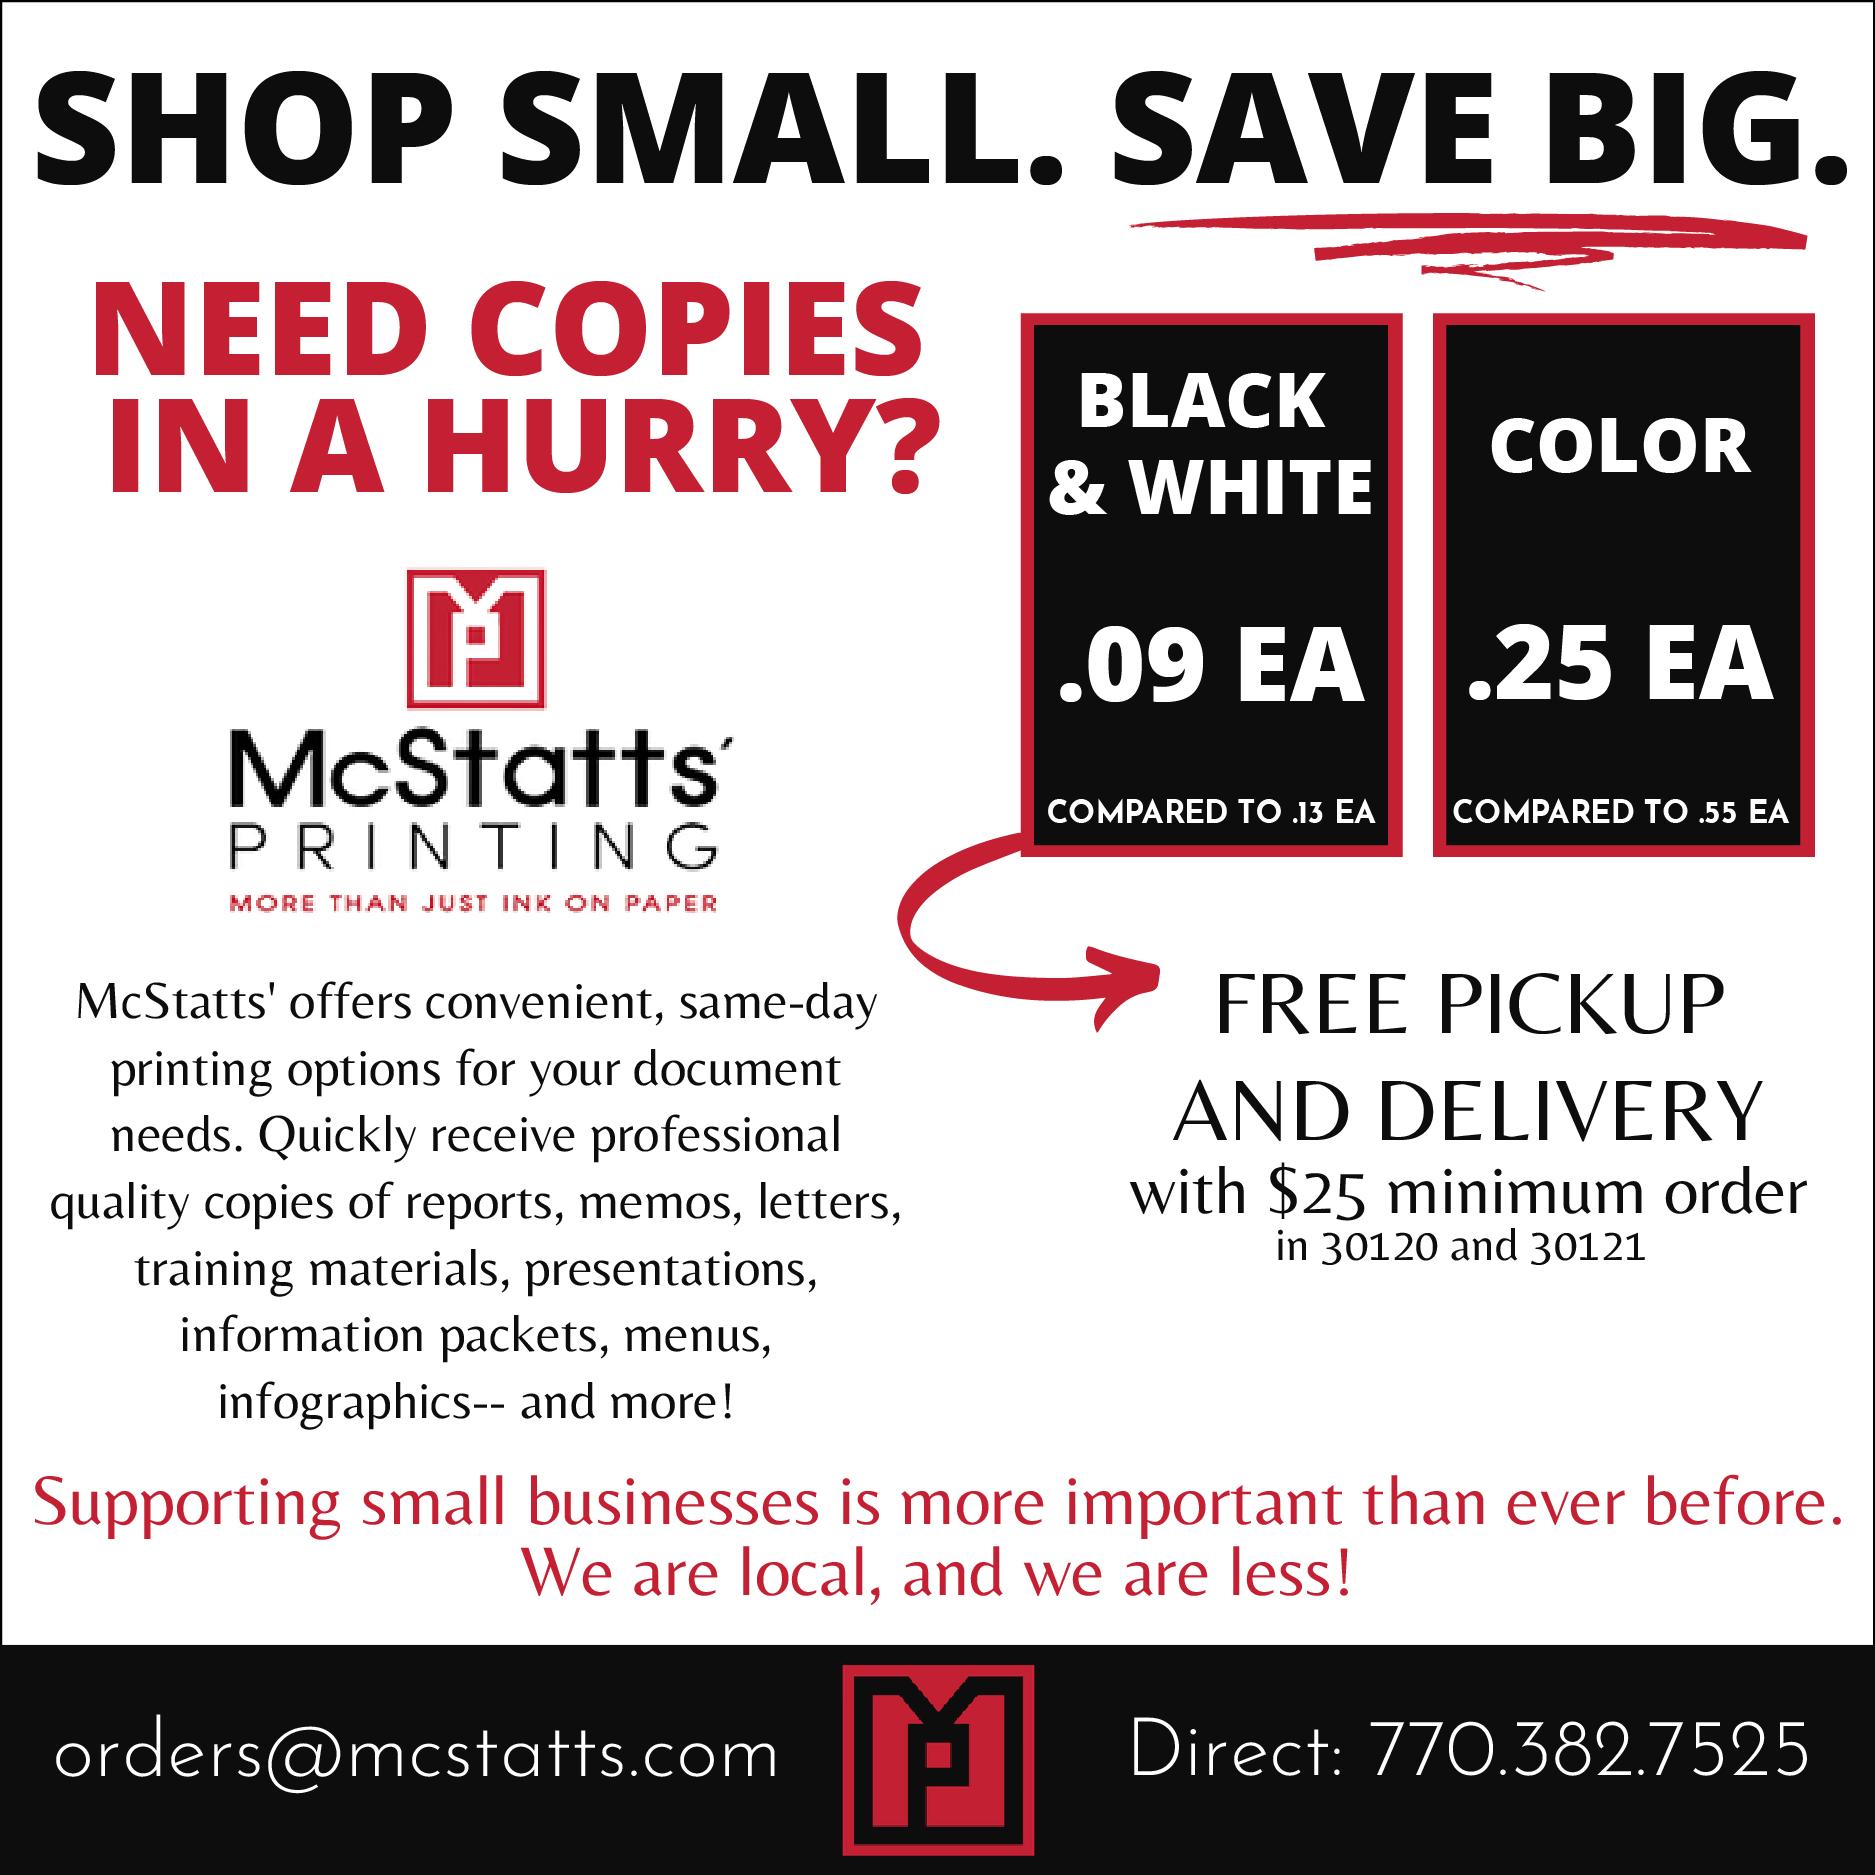 Shop Small - Save Big